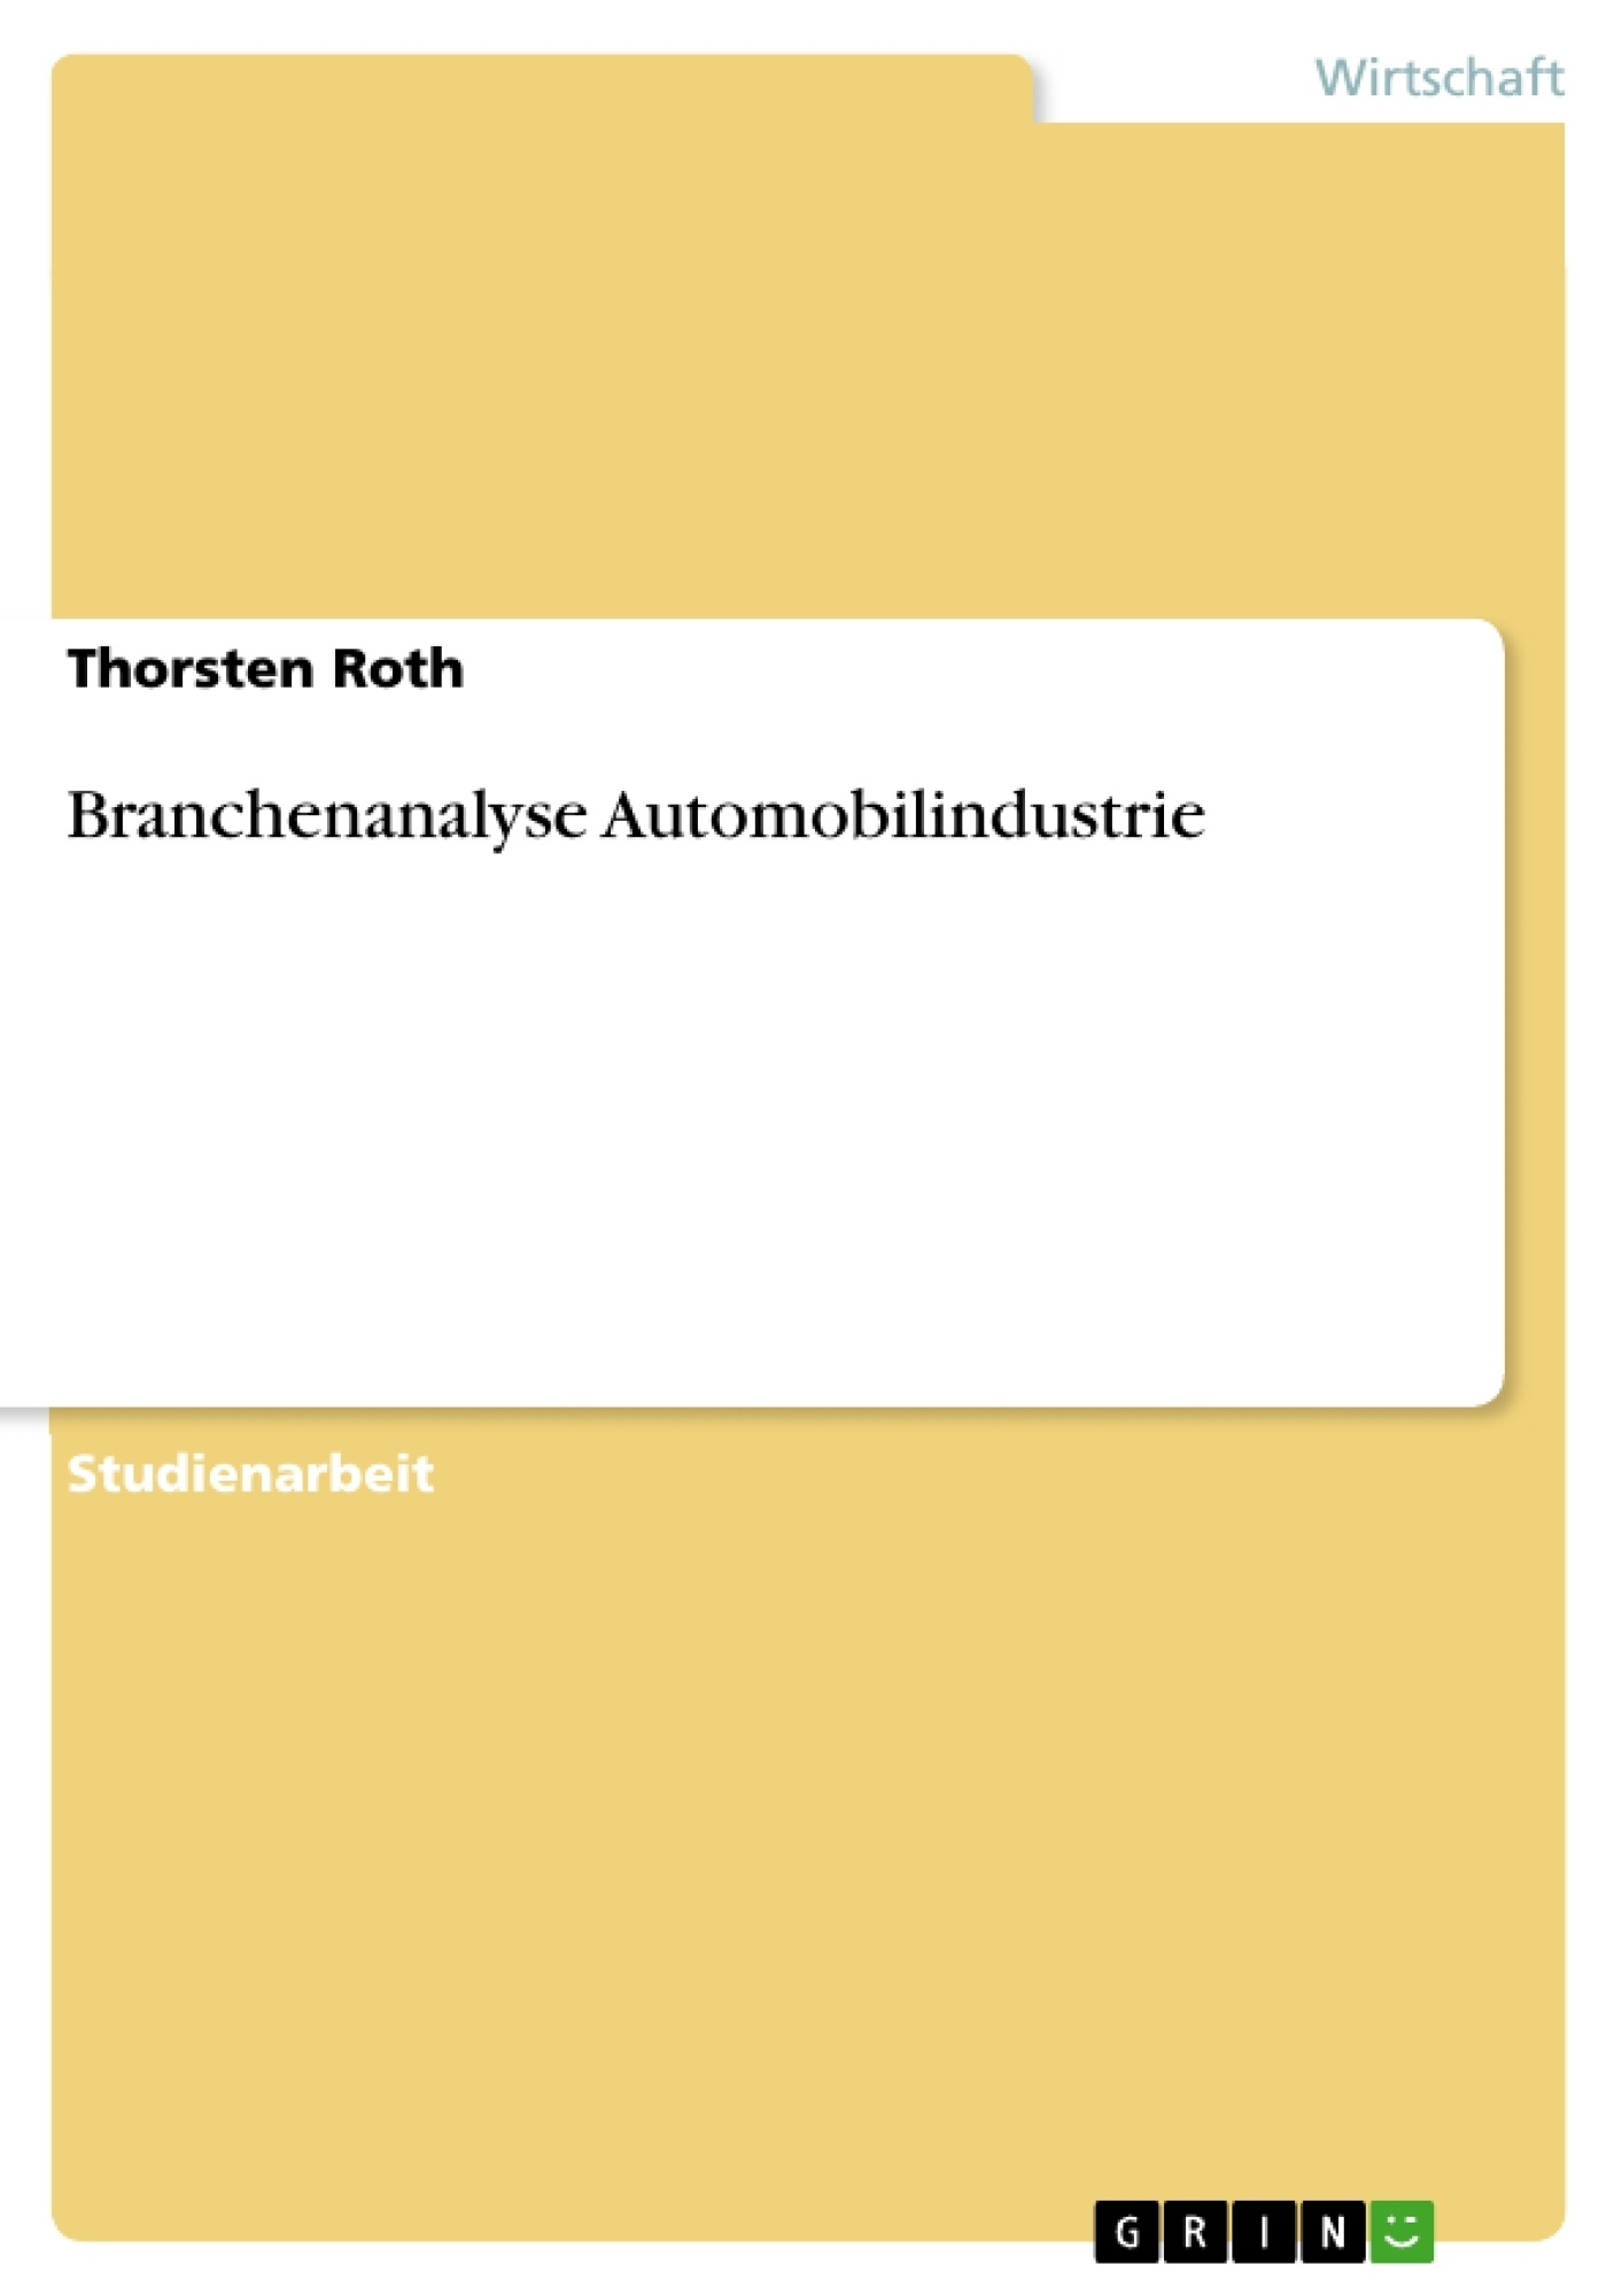 Titel: Branchenanalyse Automobilindustrie